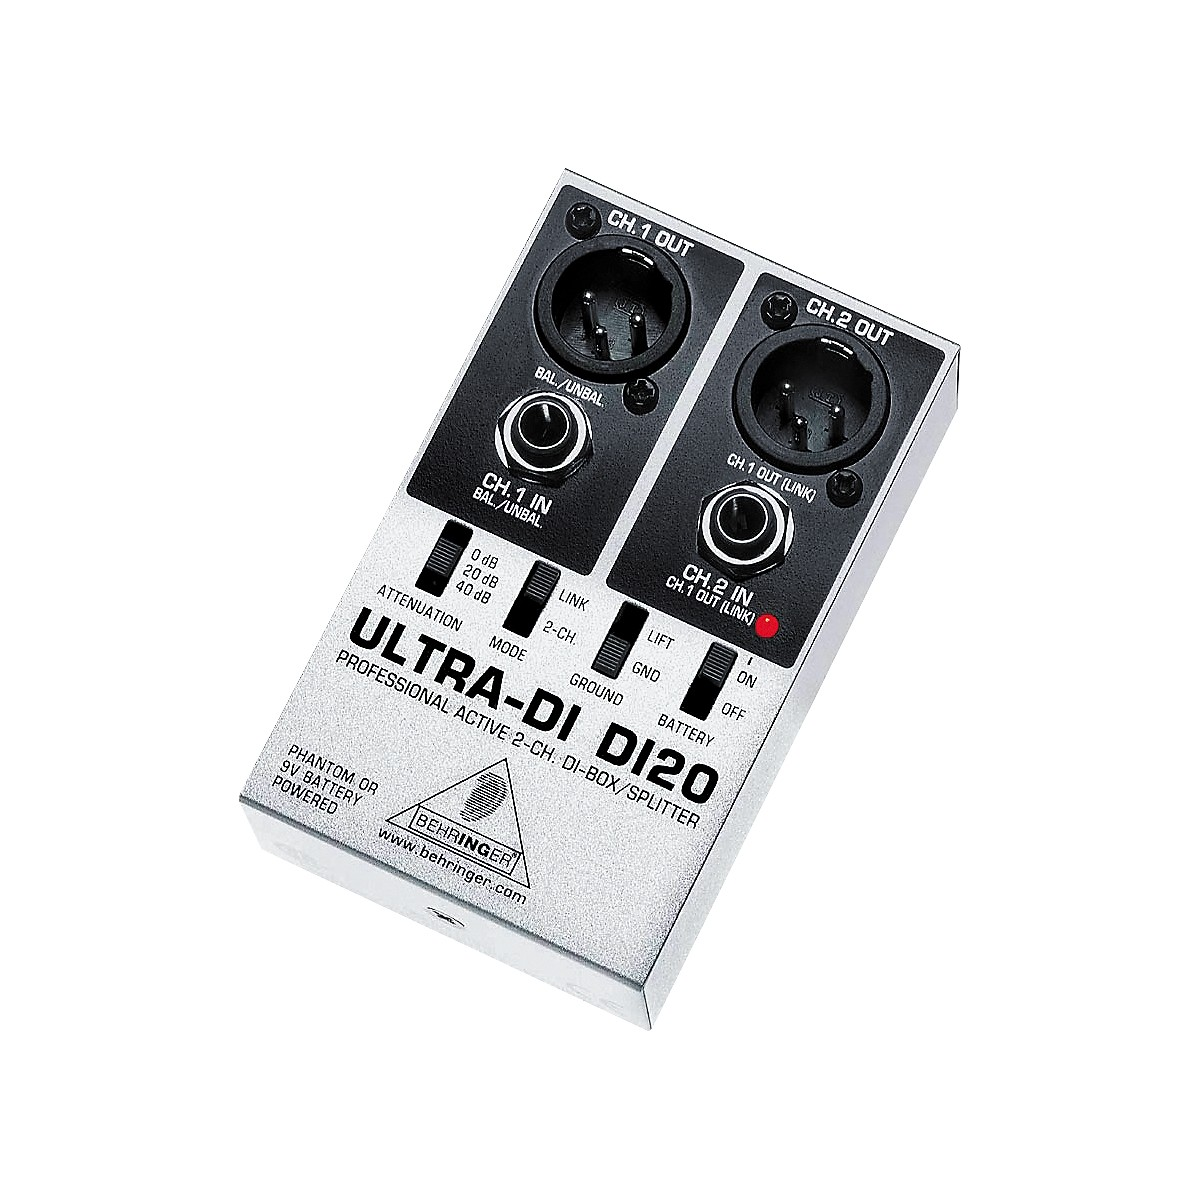 Behringer DI20 Ultra DI 2-Channel Active DI Box/Splitter